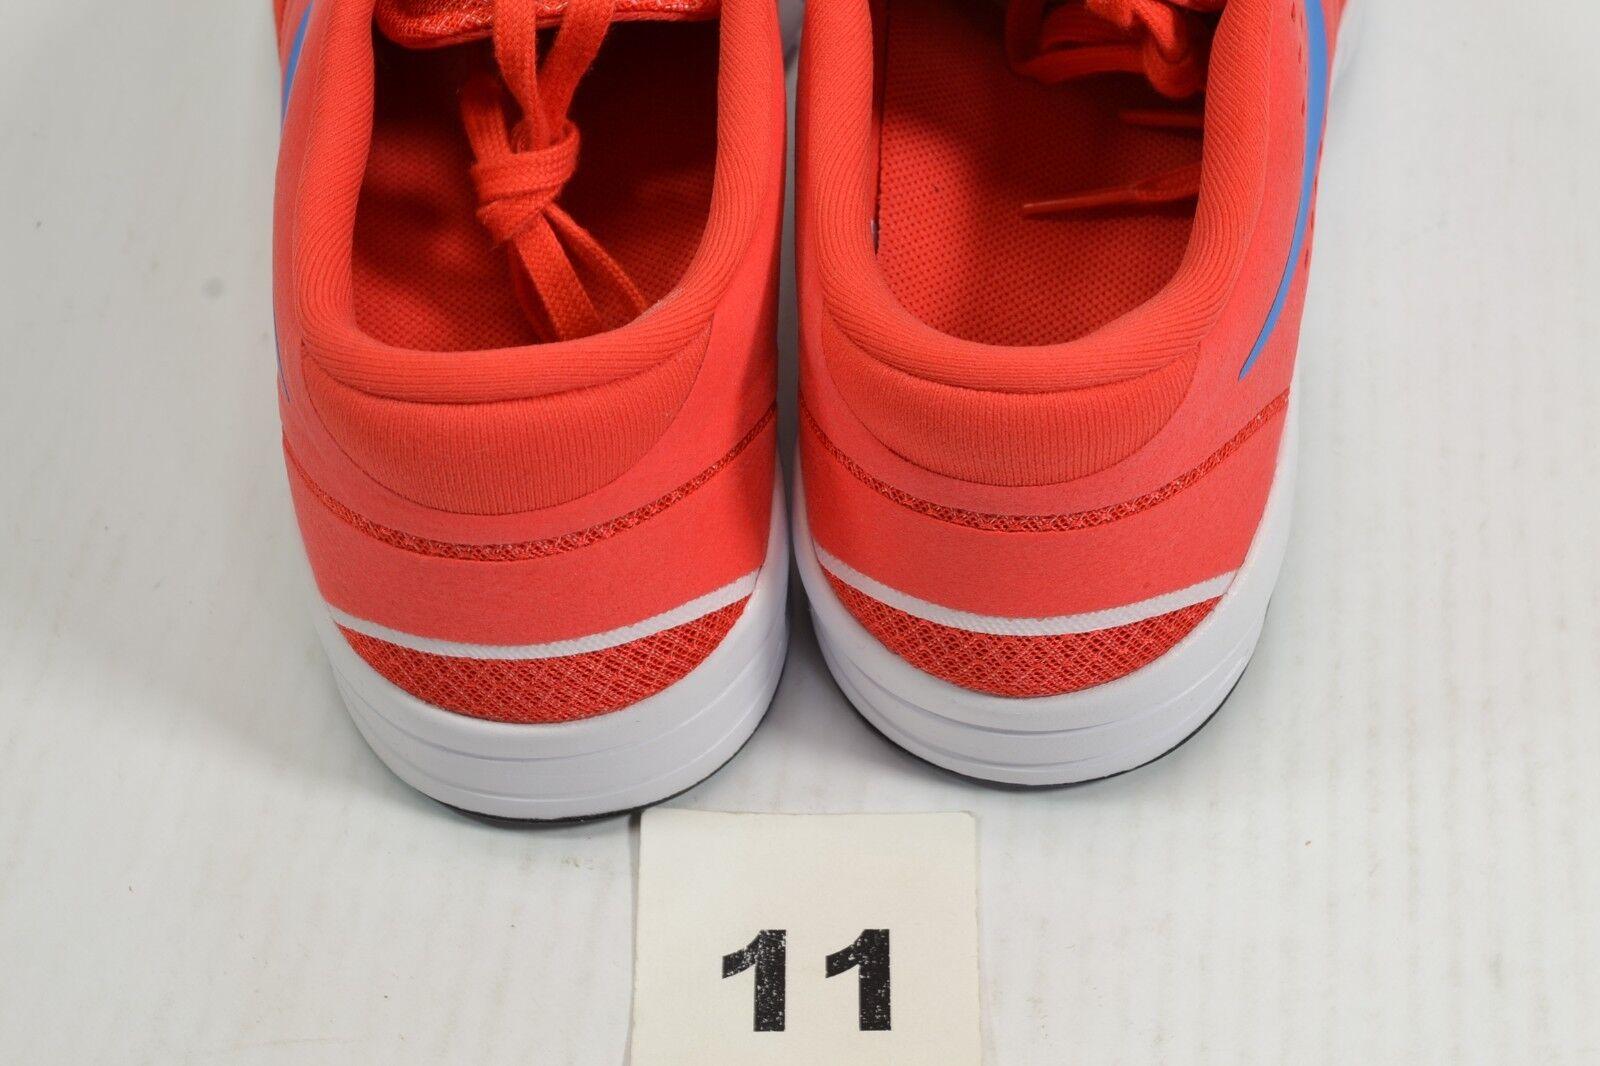 Nike ERIC KOSTON 2 Bleu MAX Light Crimson Photo Bleu 2 Discounted (358) homme chaussures b5bdc0